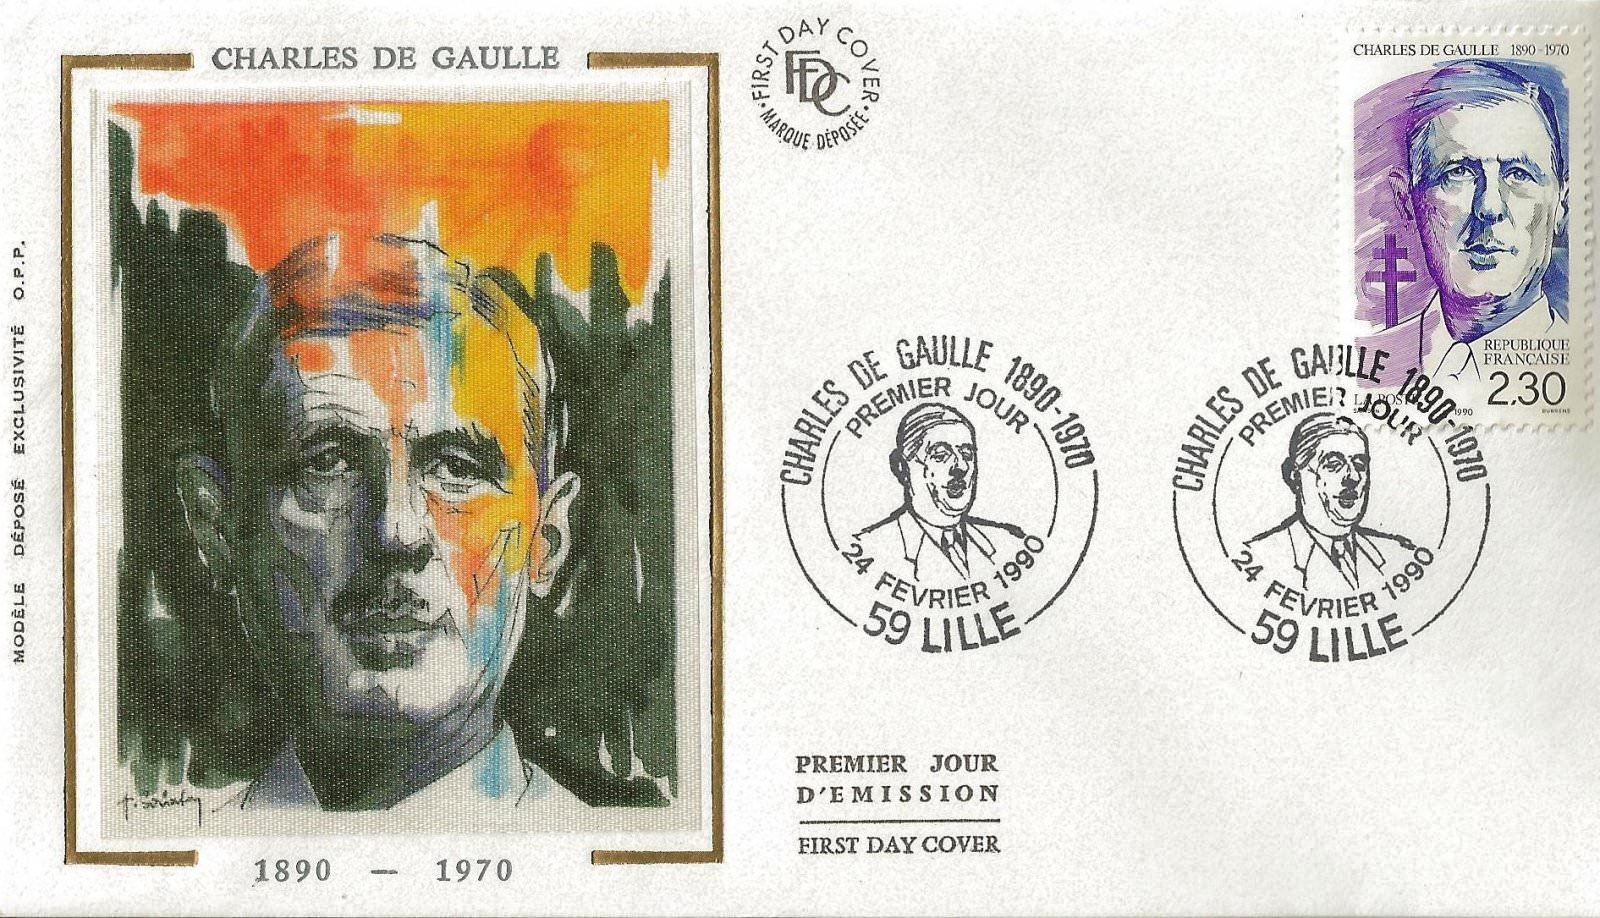 CHARLES DE GAULLE 1990